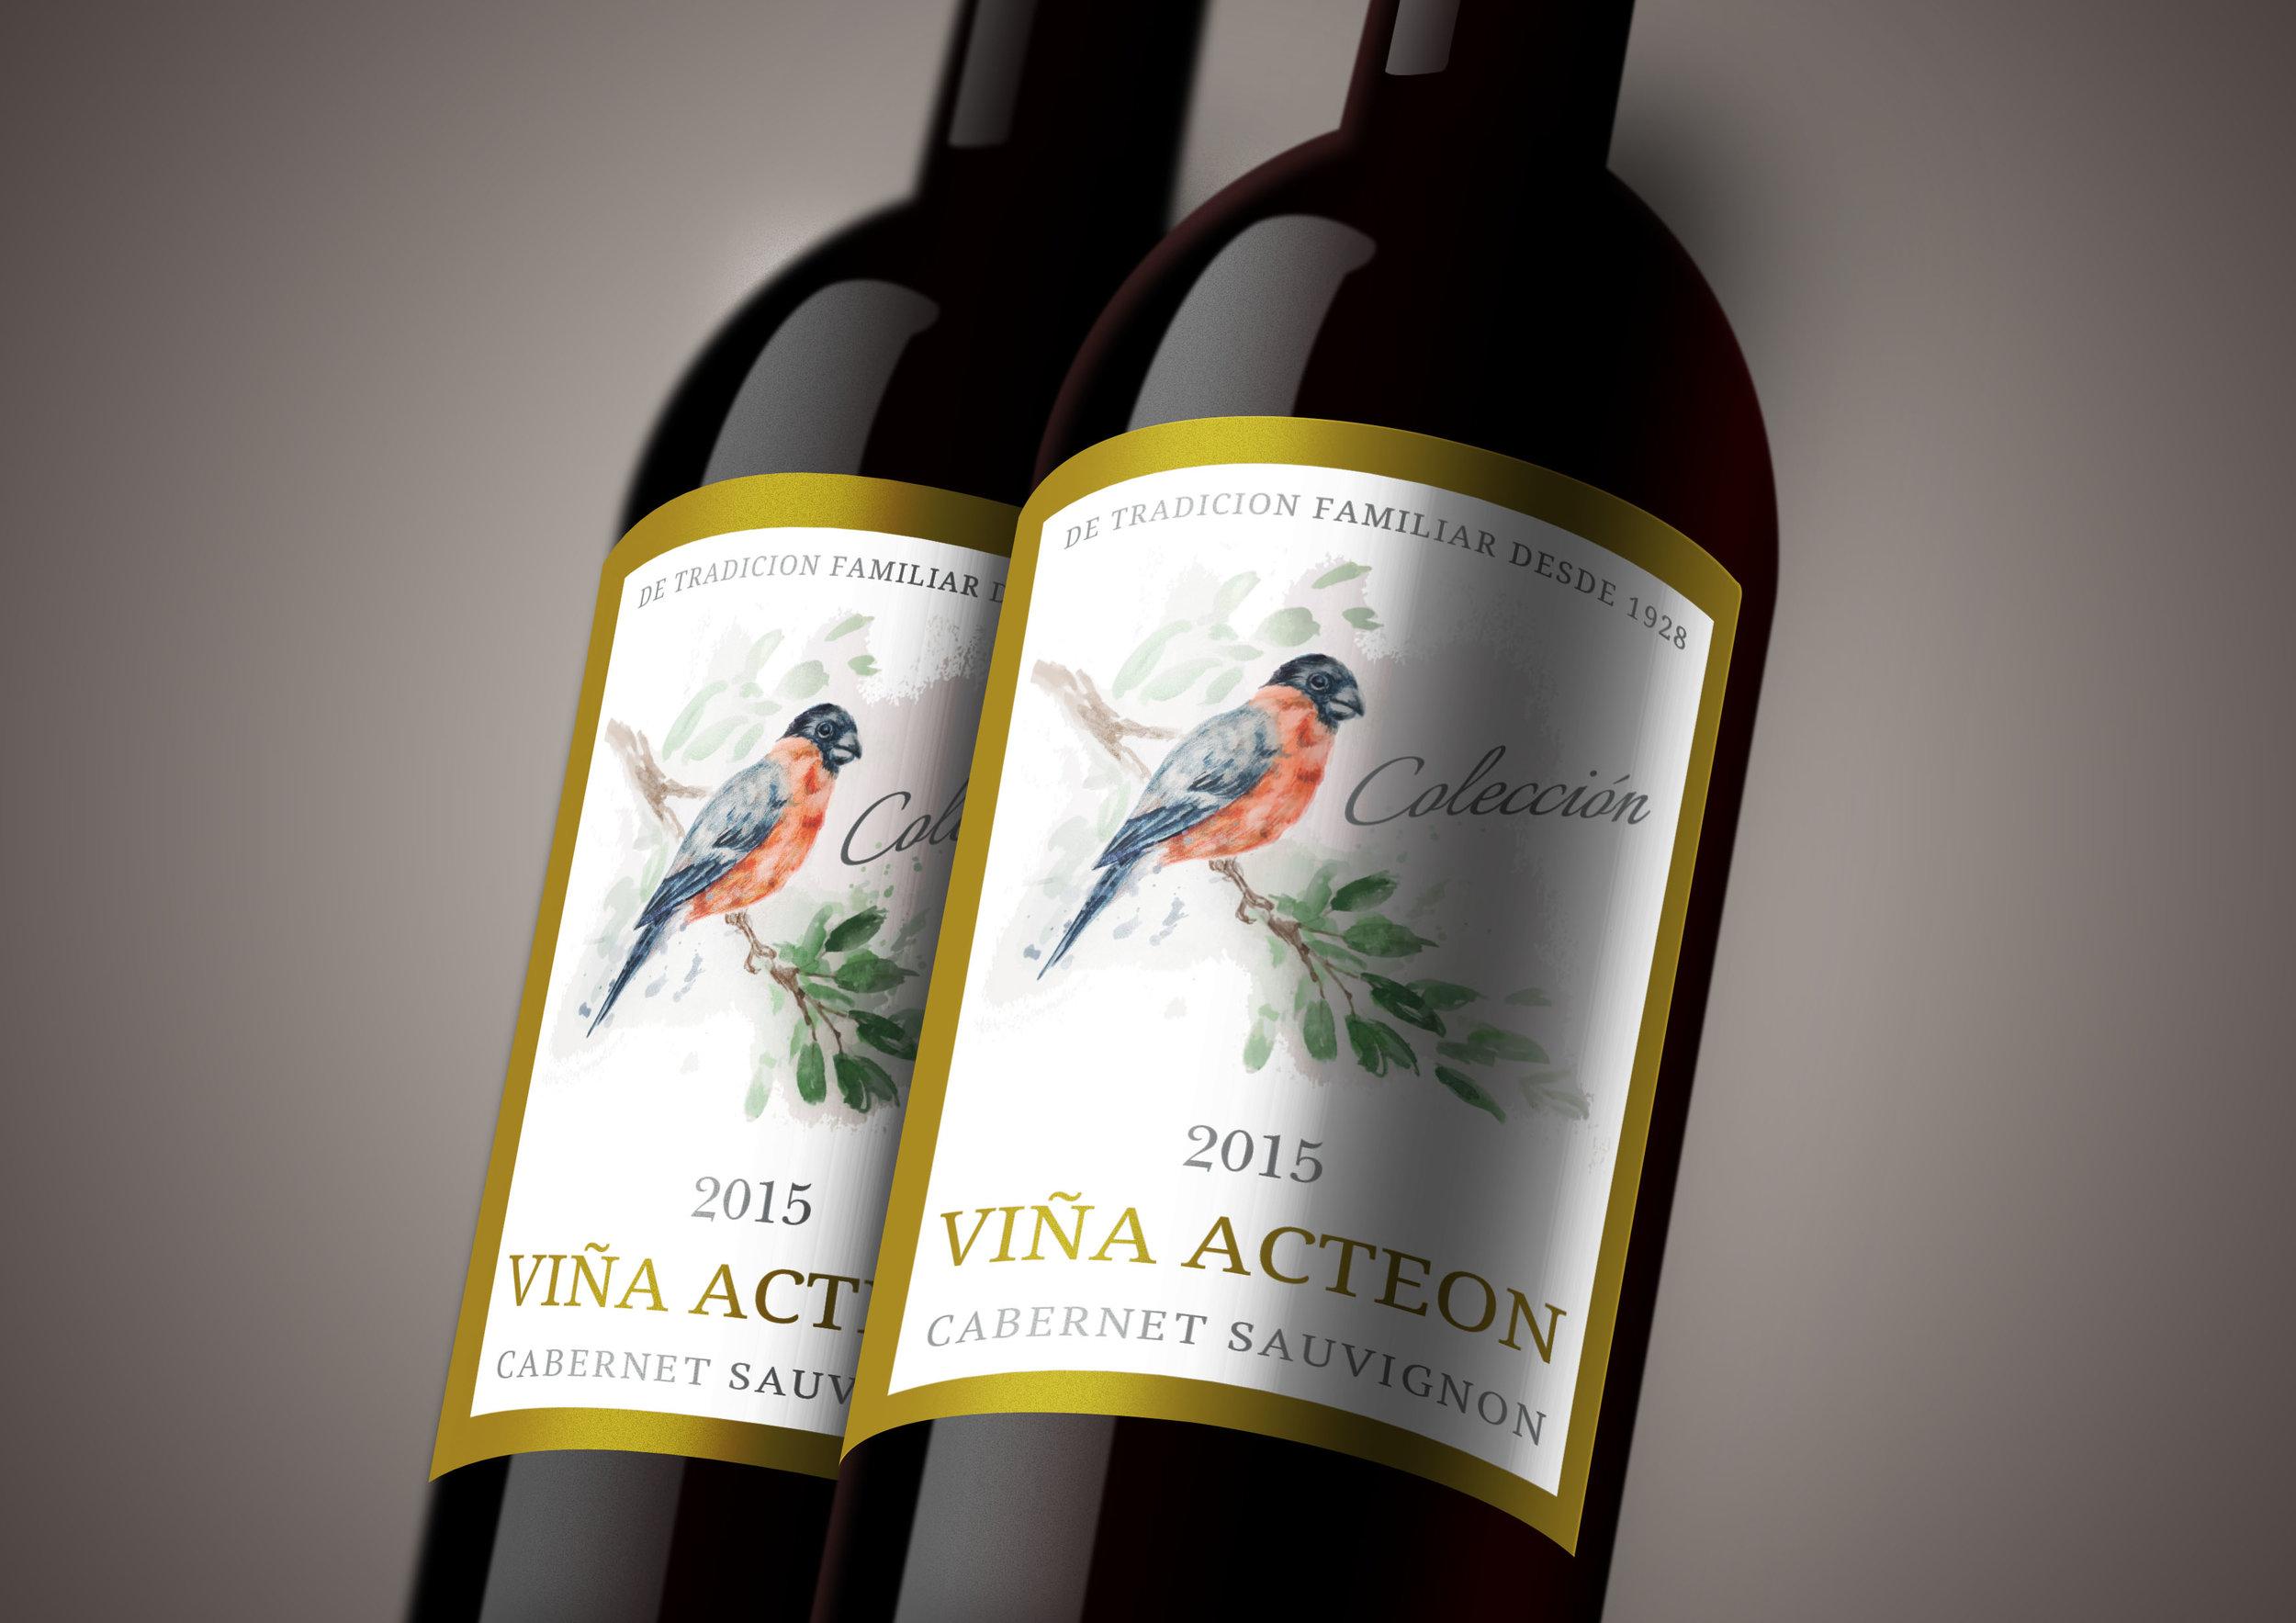 Vina Acteon 2 Bottle Shot Mock Up.jpg